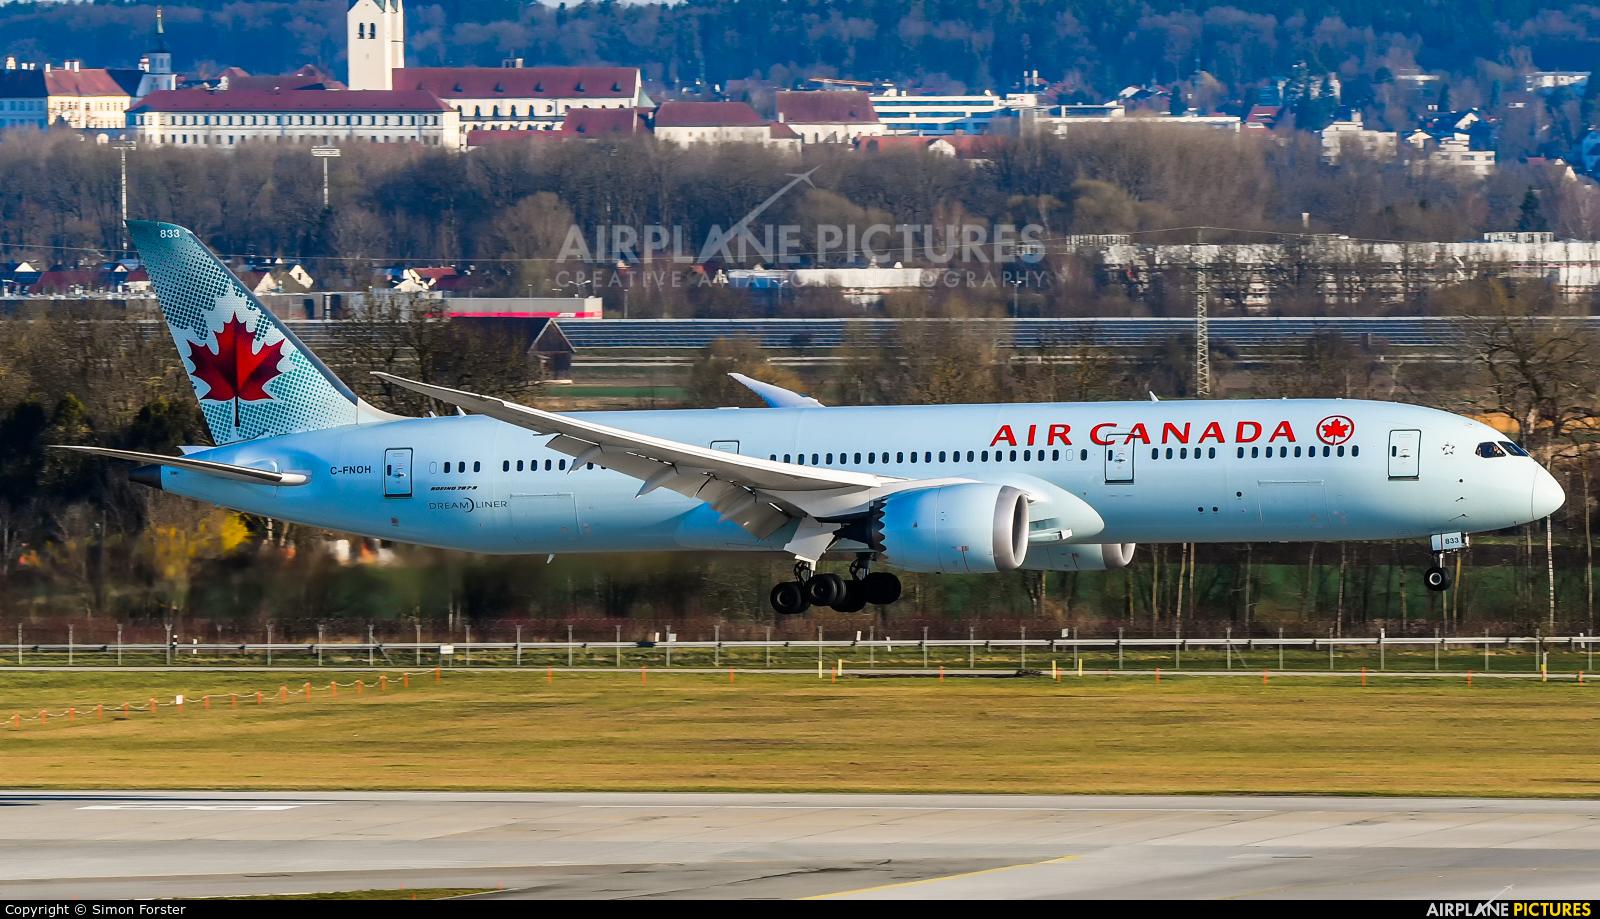 Air Canada C-FNOH aircraft at Munich